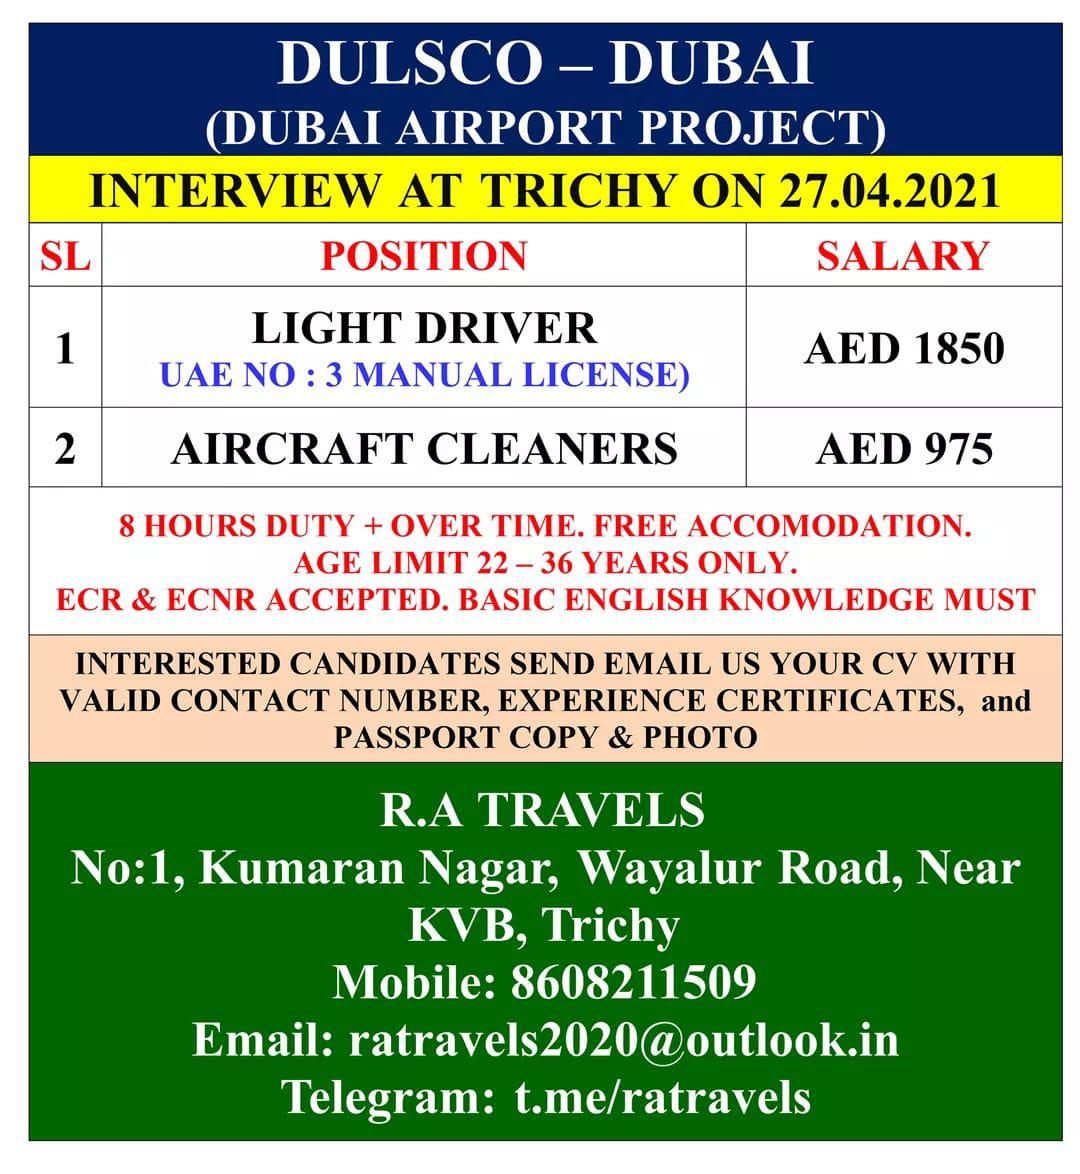 DULSCO – DUBAI (DUBAI AIRPORT PROJECT)